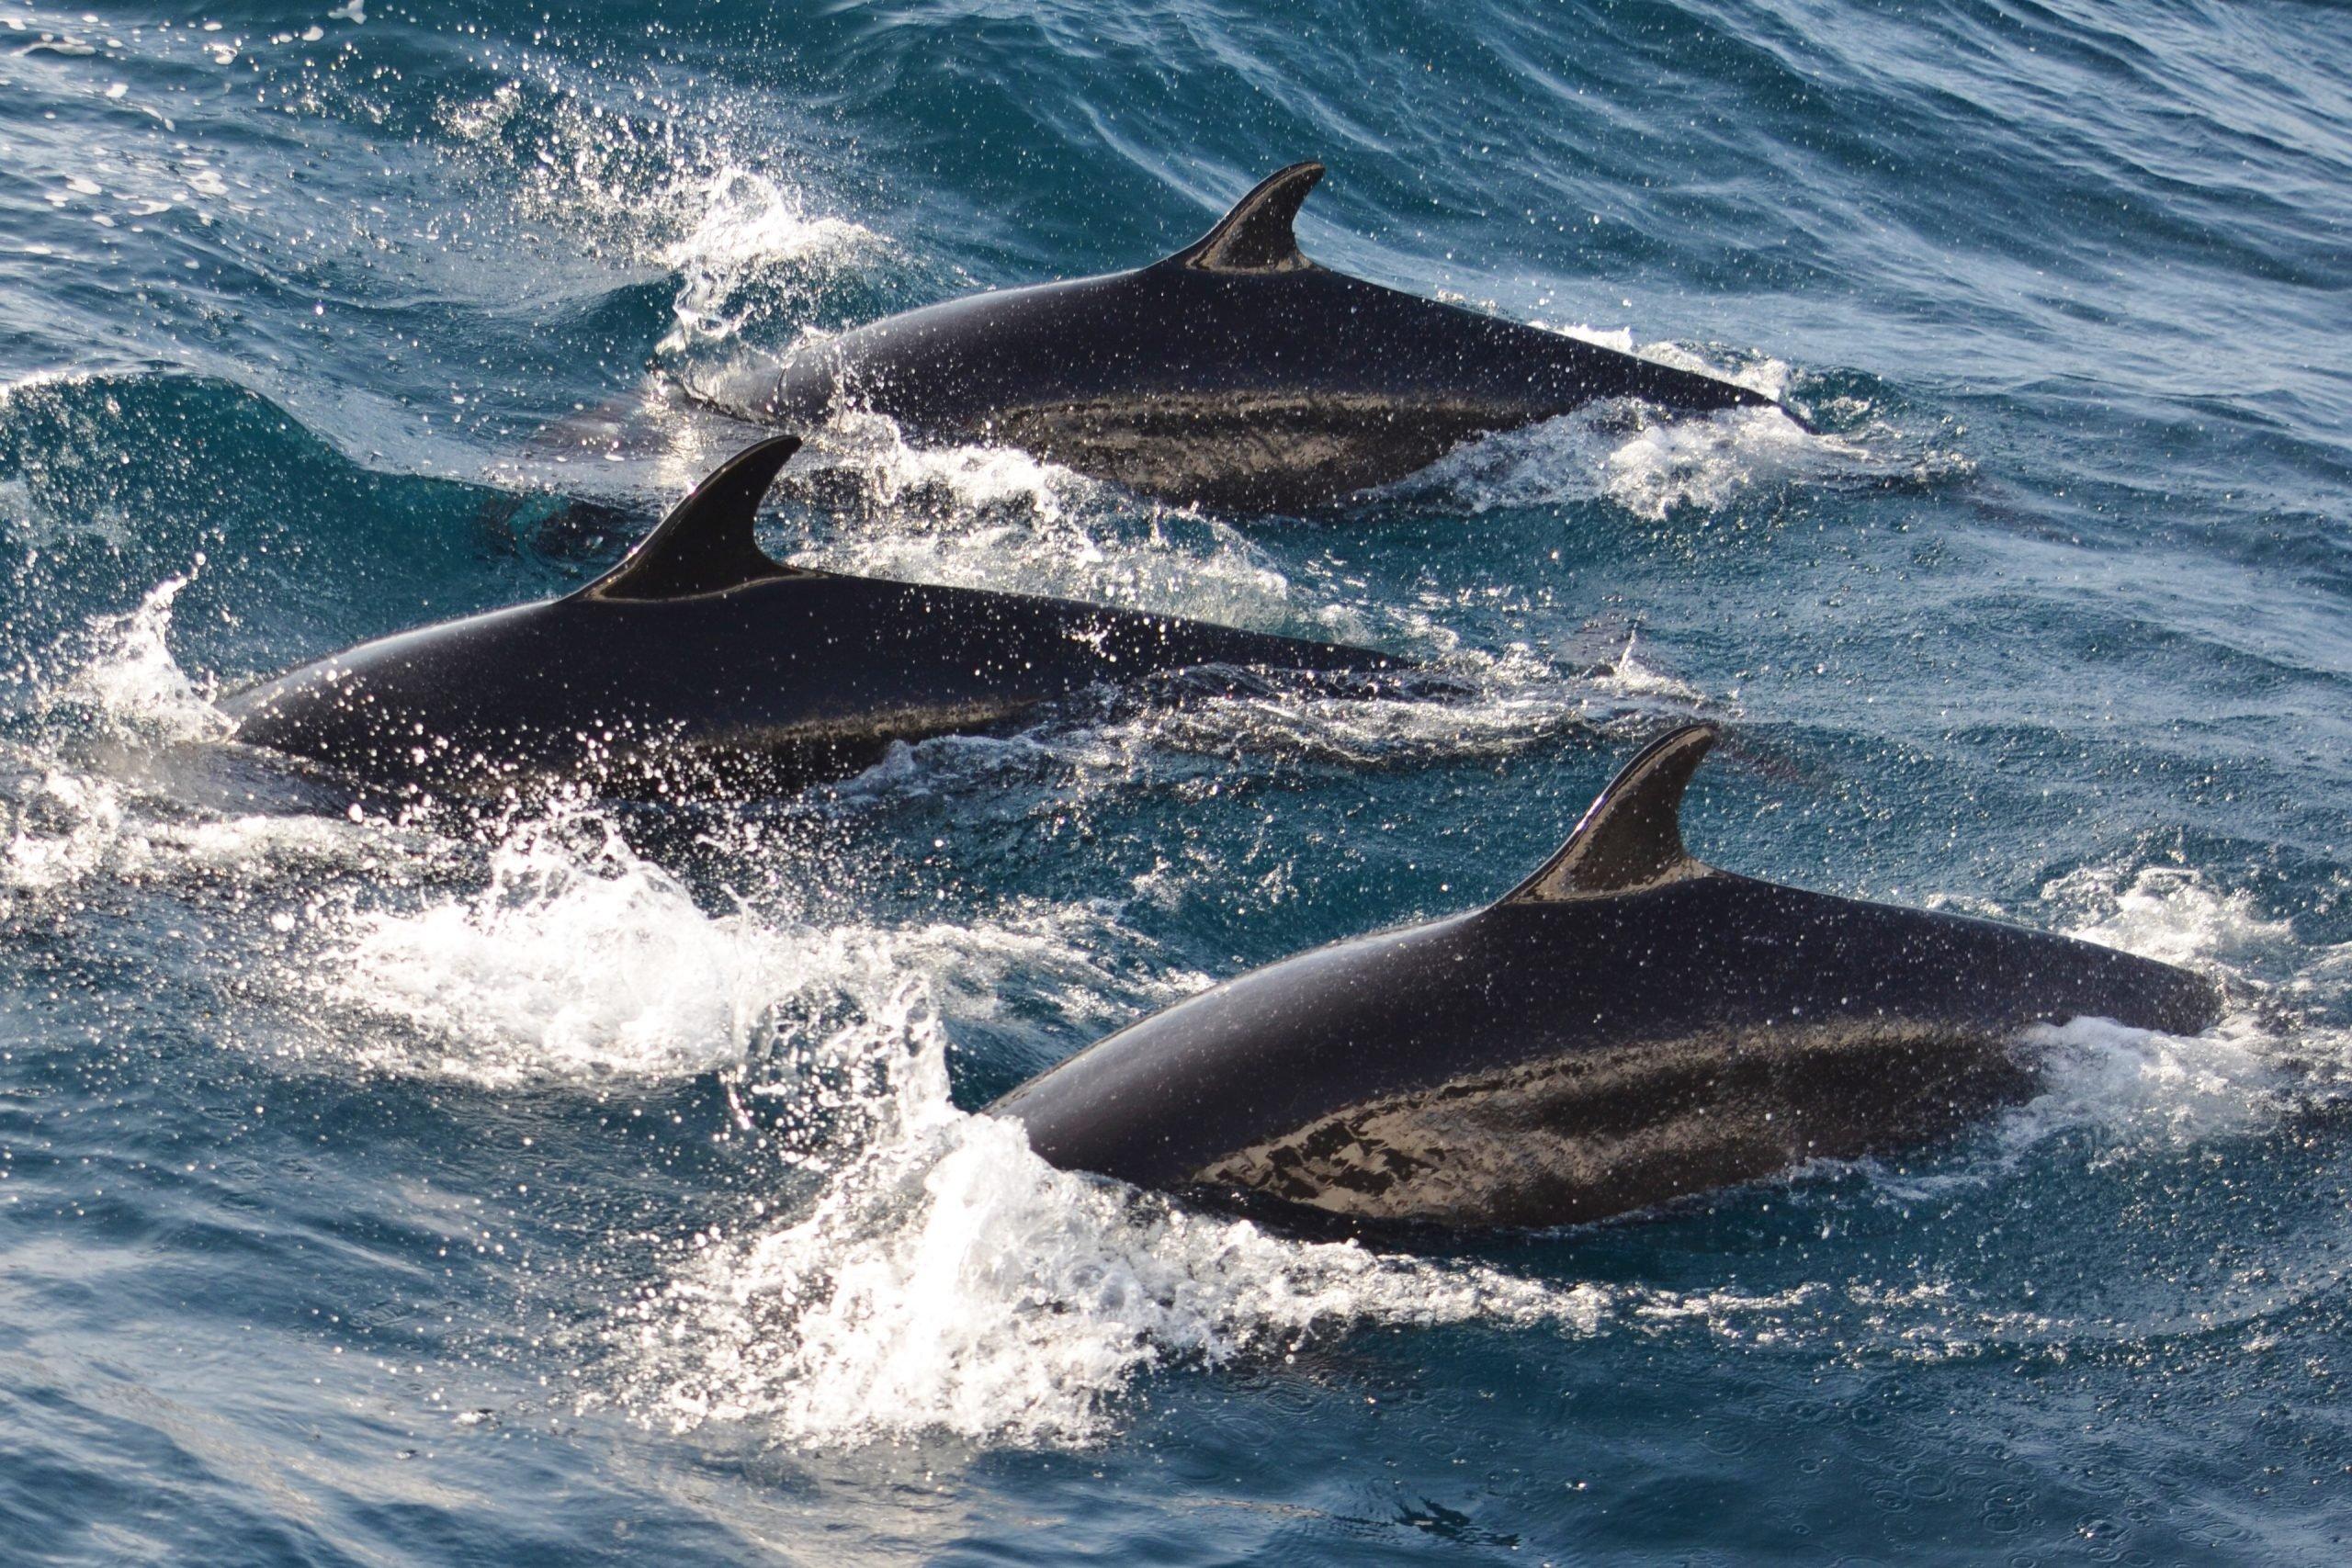 pod of false killer whales